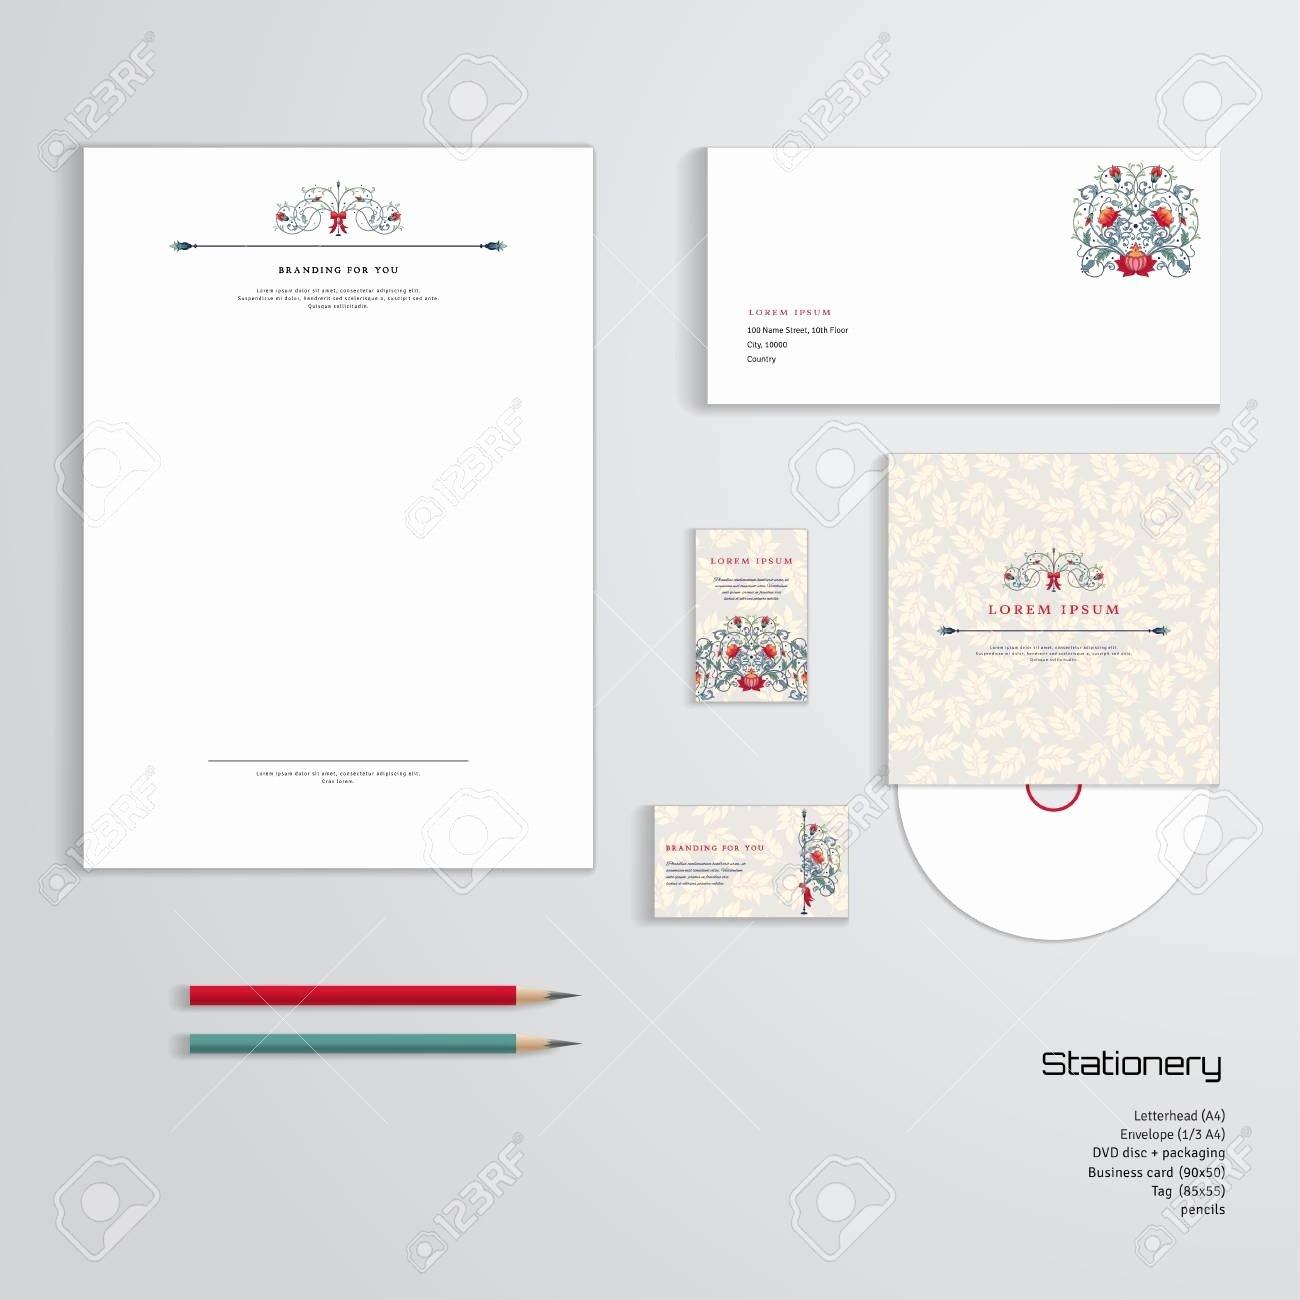 Business Card Letterhead Envelope Template Beautiful Vector Identity For Business Card Letterhead Envelope Template